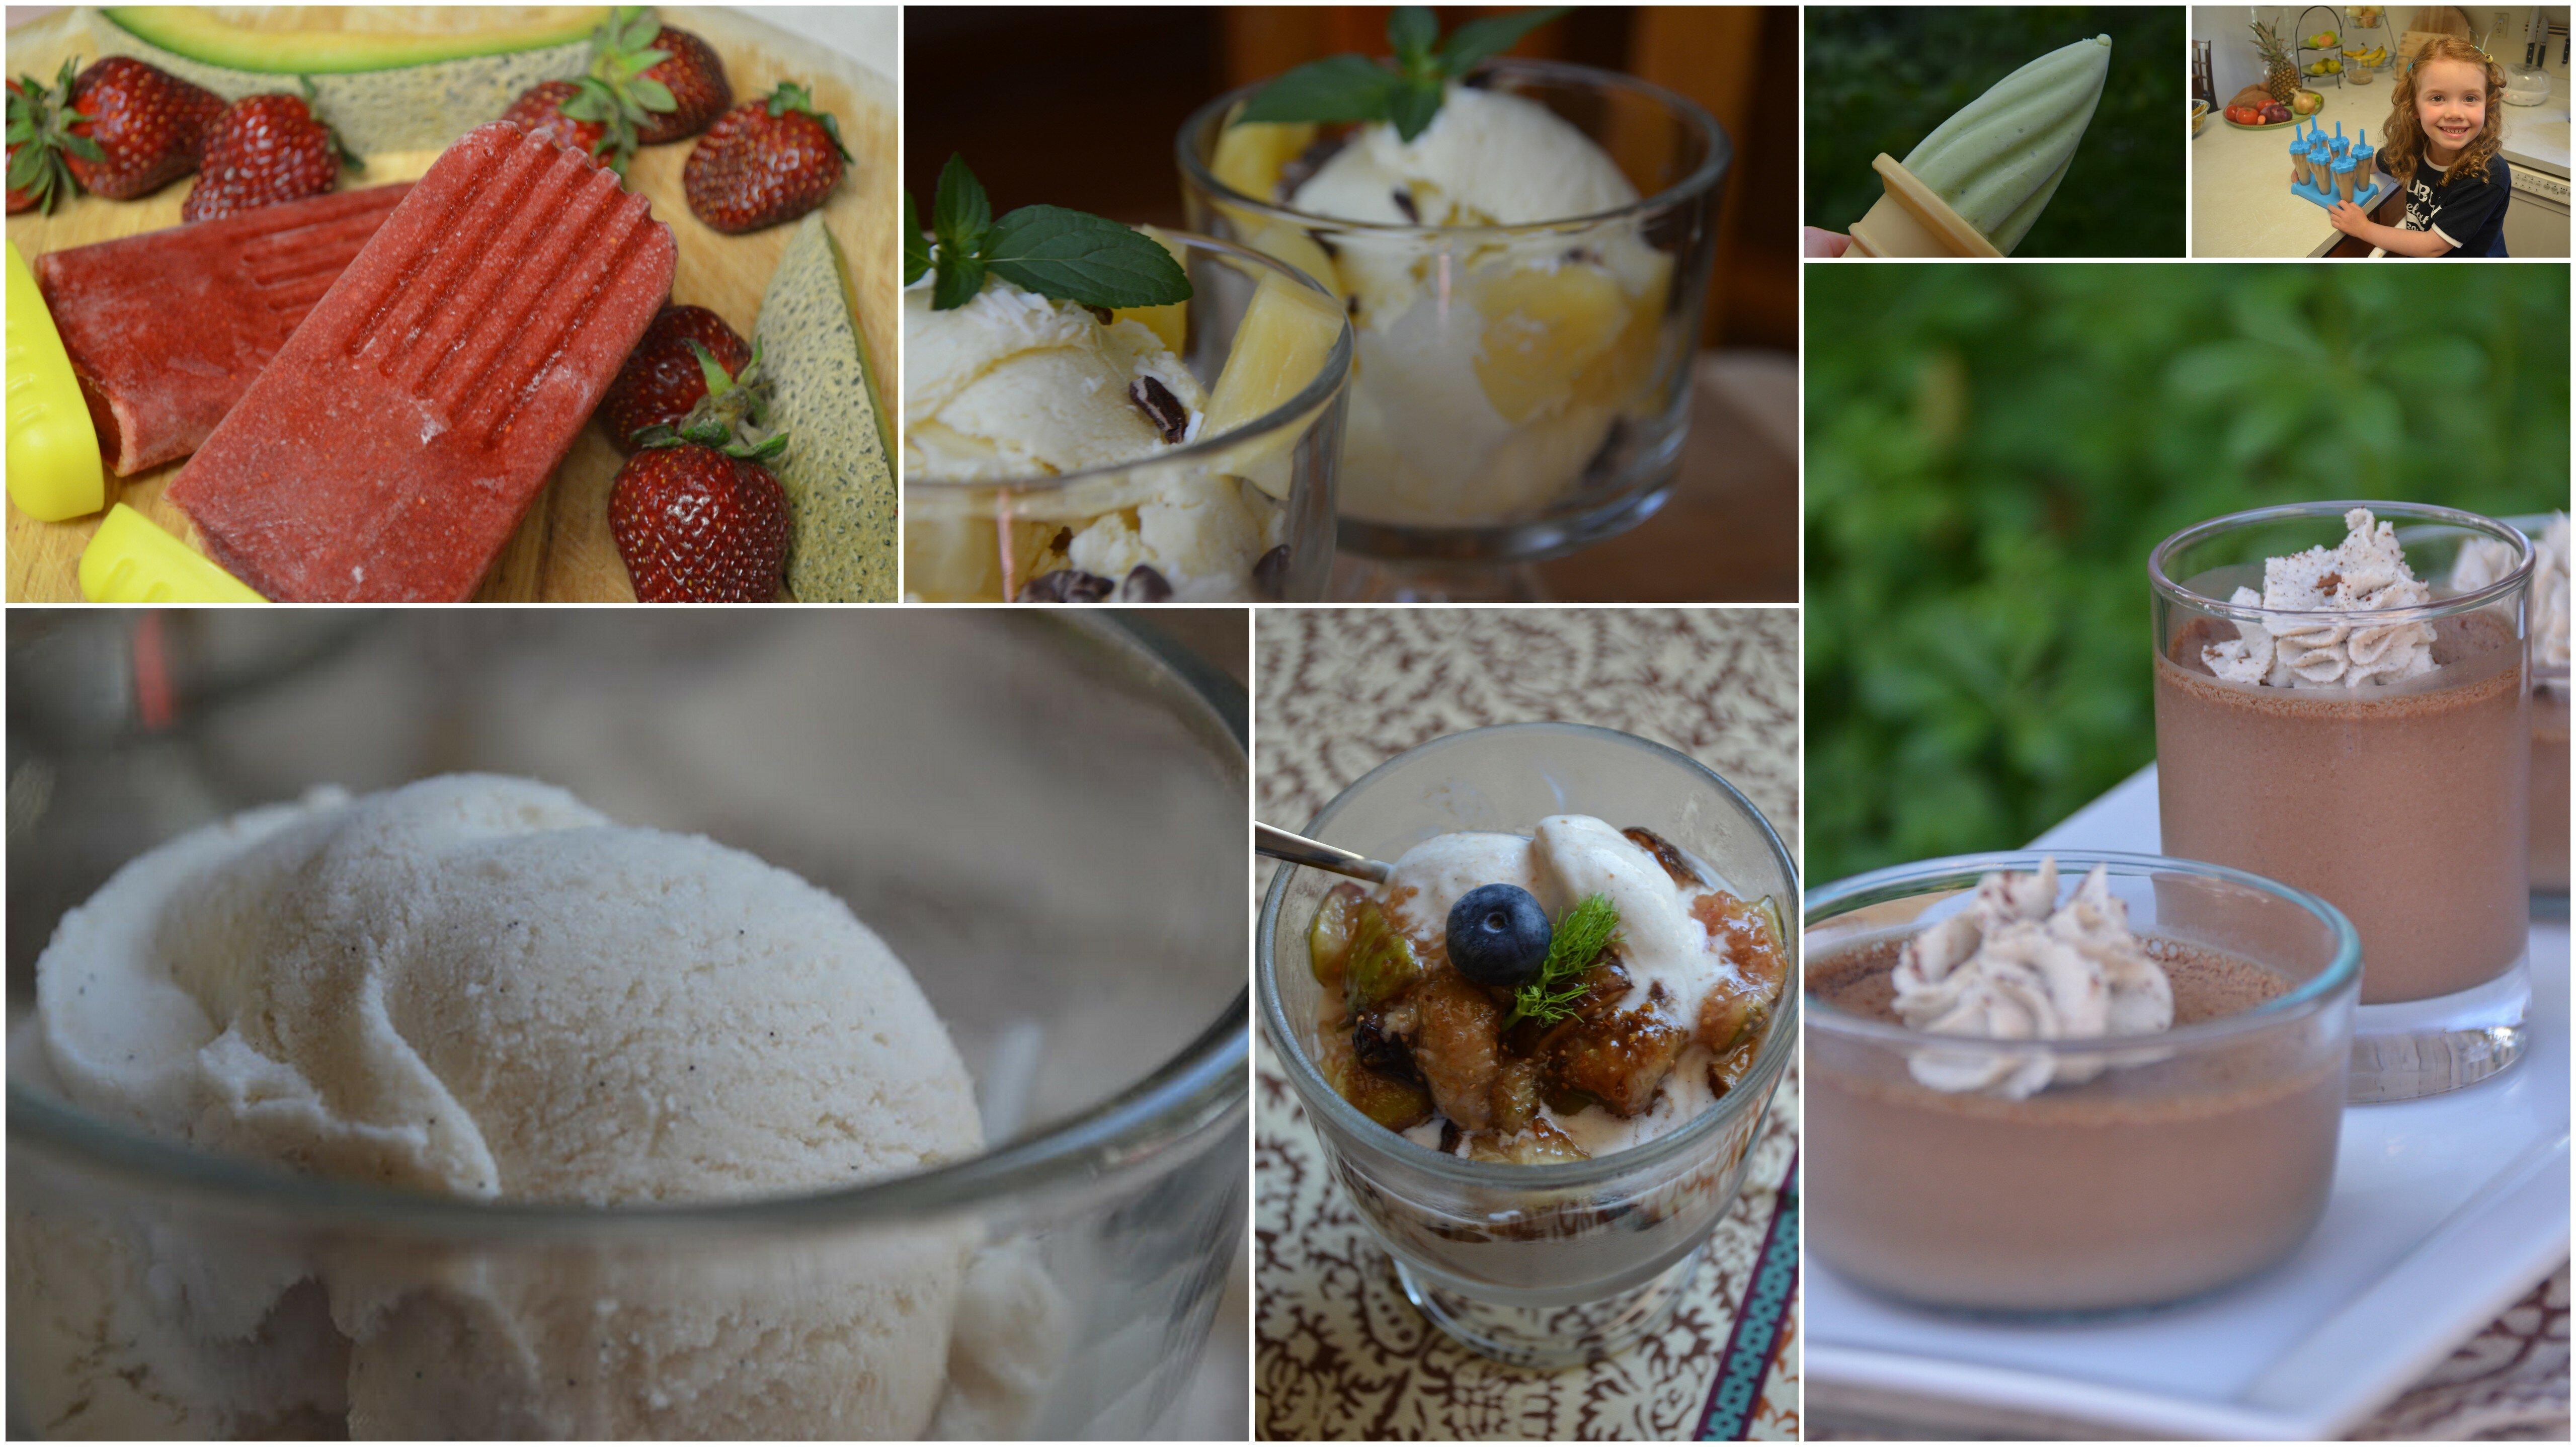 aip desserts2